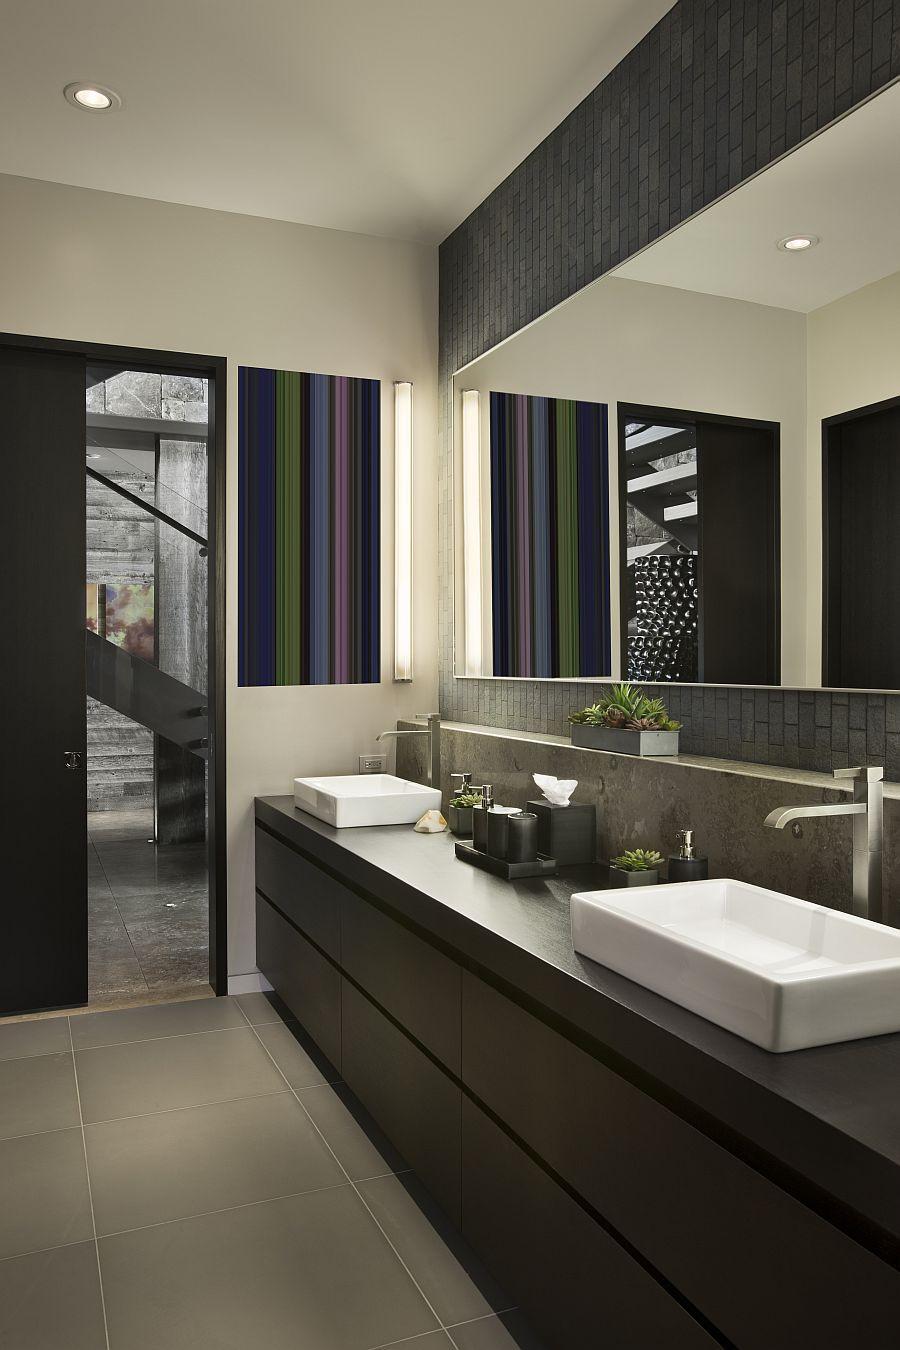 Modern Bathroom Design Ideas  Guest Bathroom Ideas with Pleasant Atmosphere Traba Homes